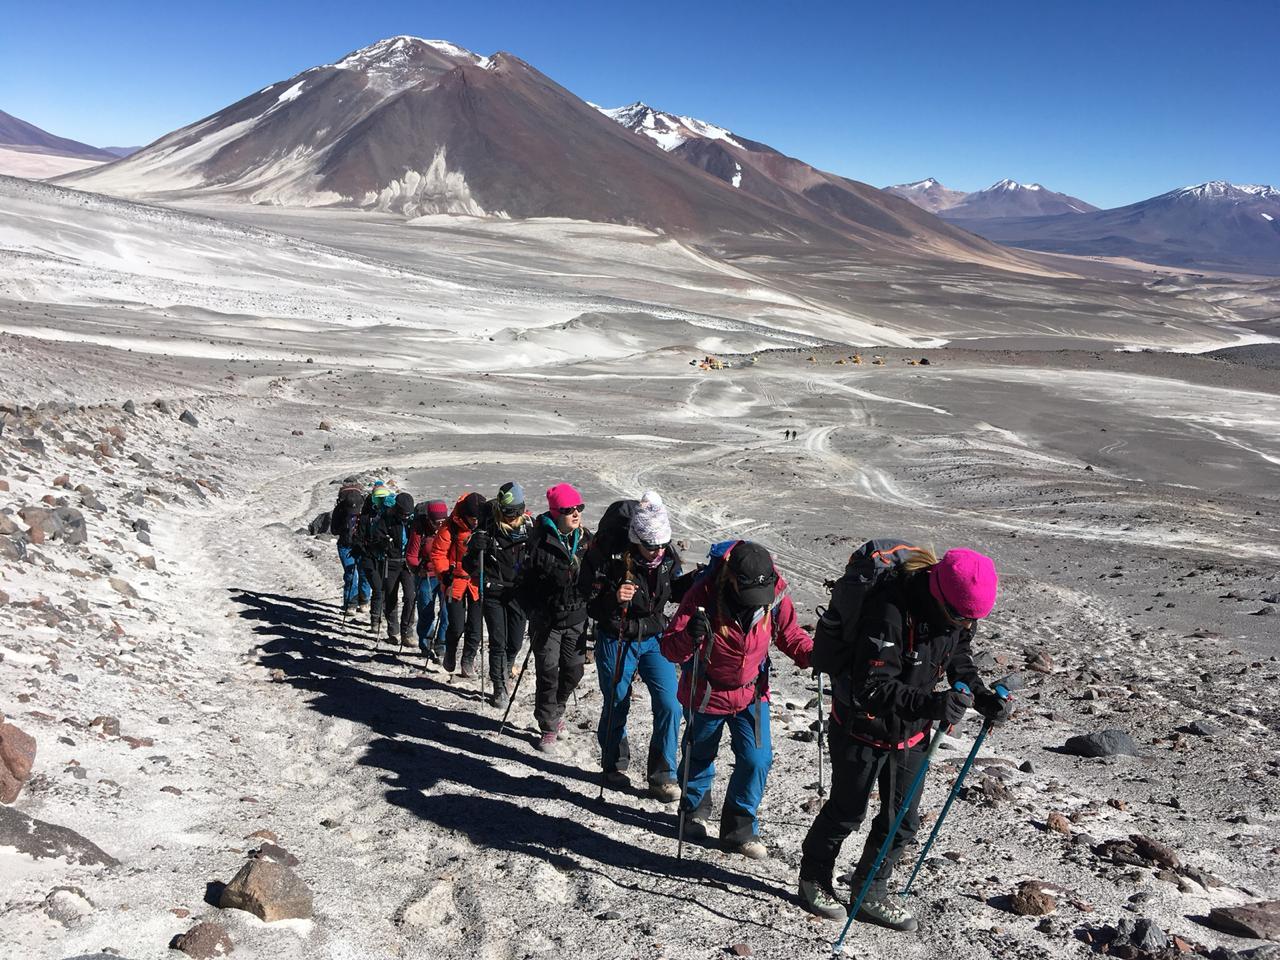 Ojos-del-Salado-Expedition-Forces-Wives-Challenge-3.jpg